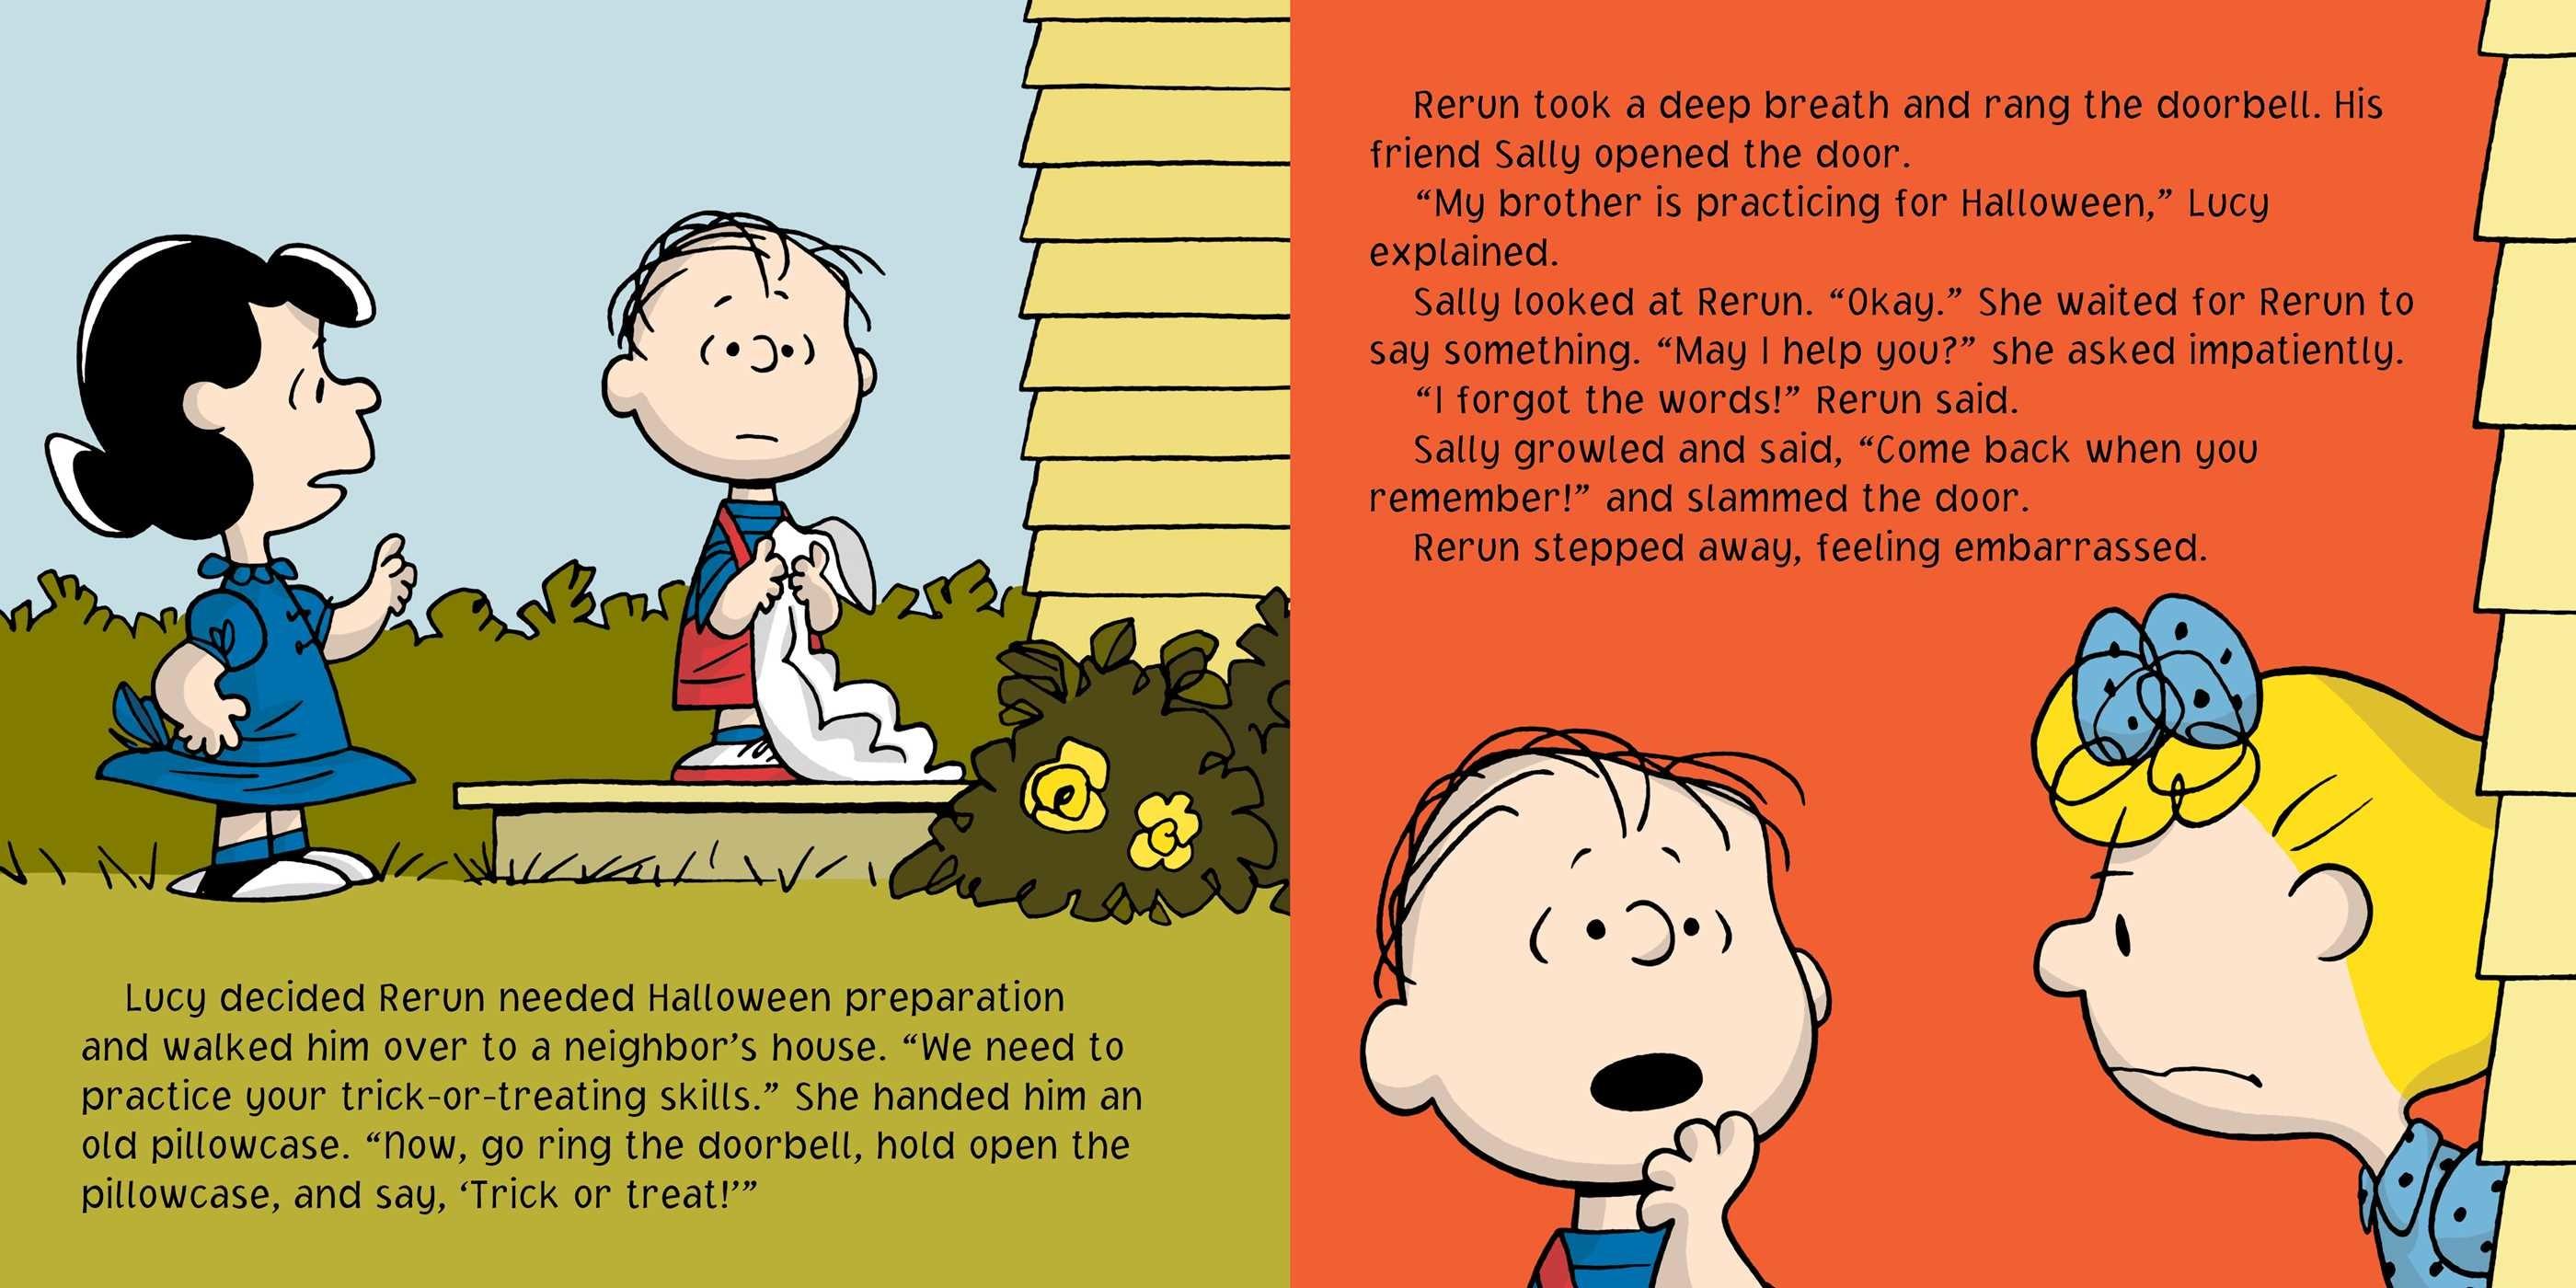 happy halloween charlie brown 9781534416413in02